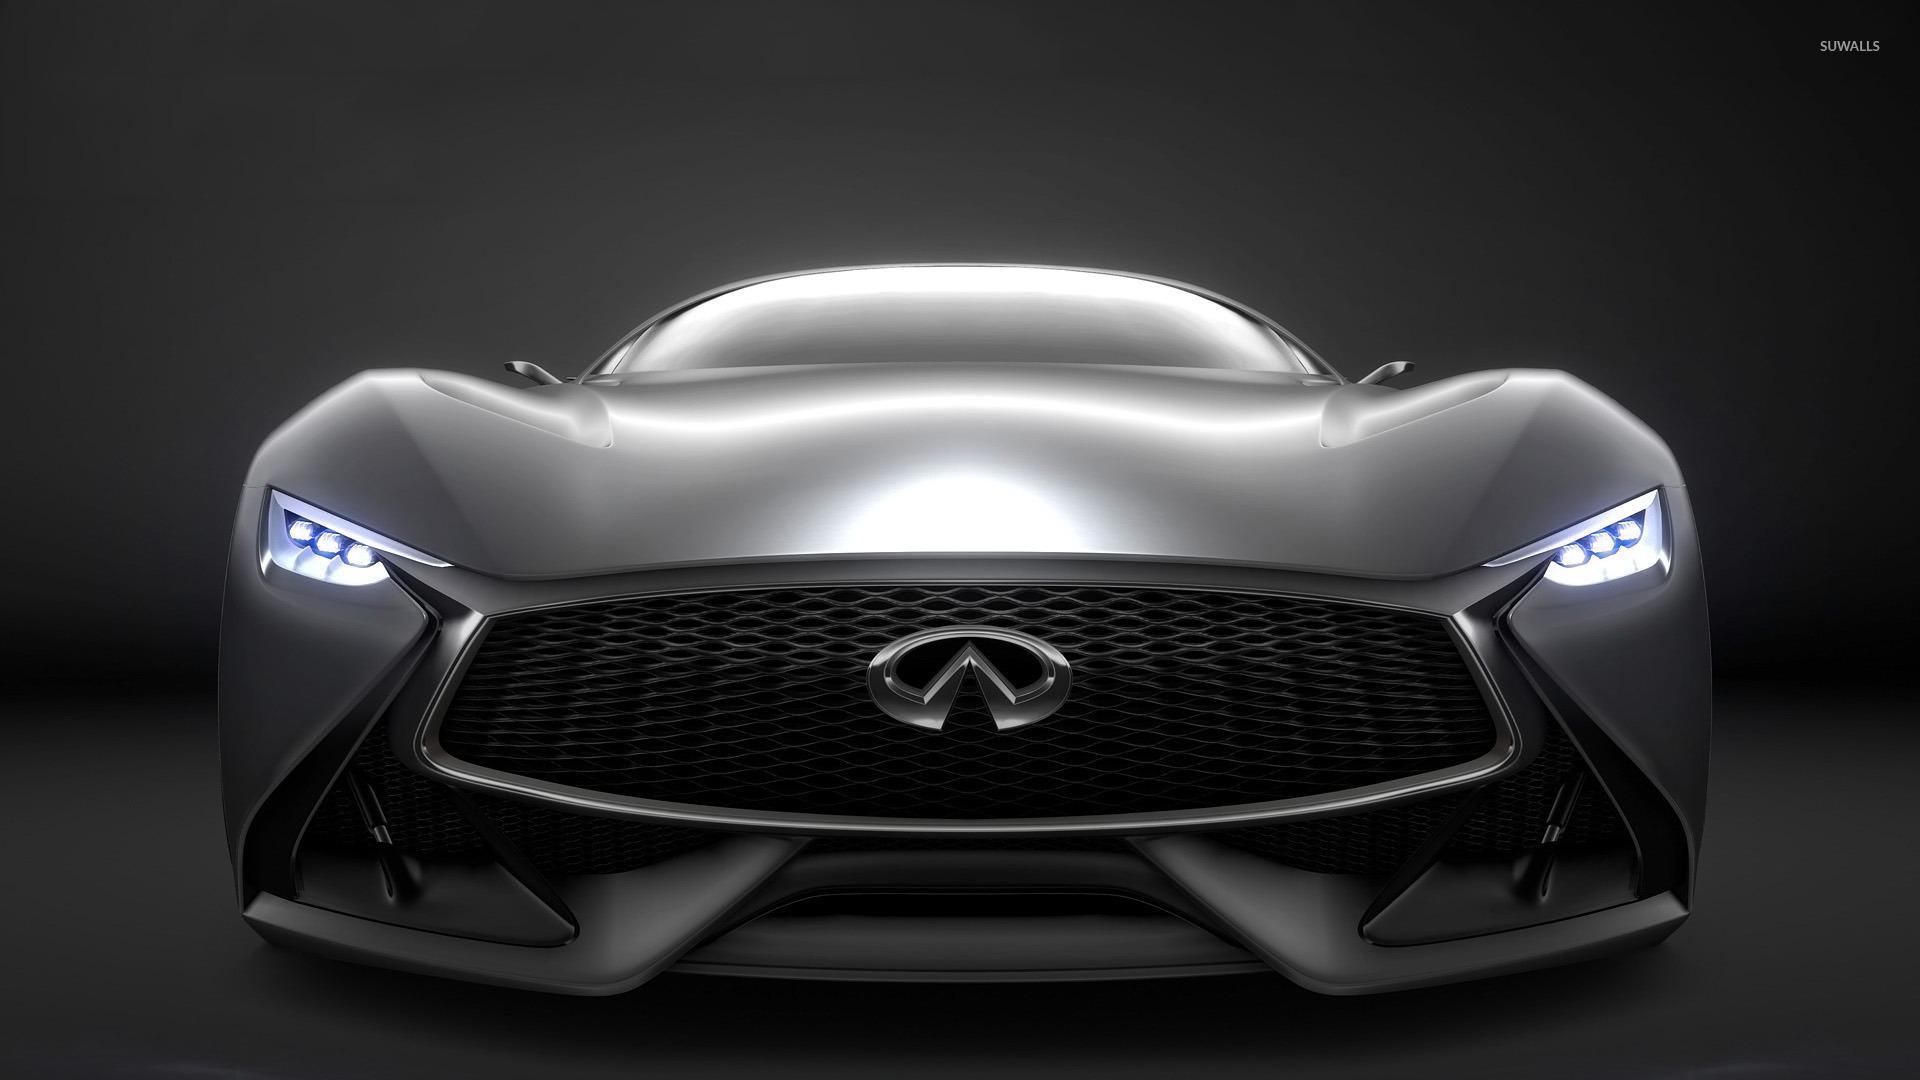 2014 Infiniti Vision Gran Turismo Concept Front Close Up Wallpaper